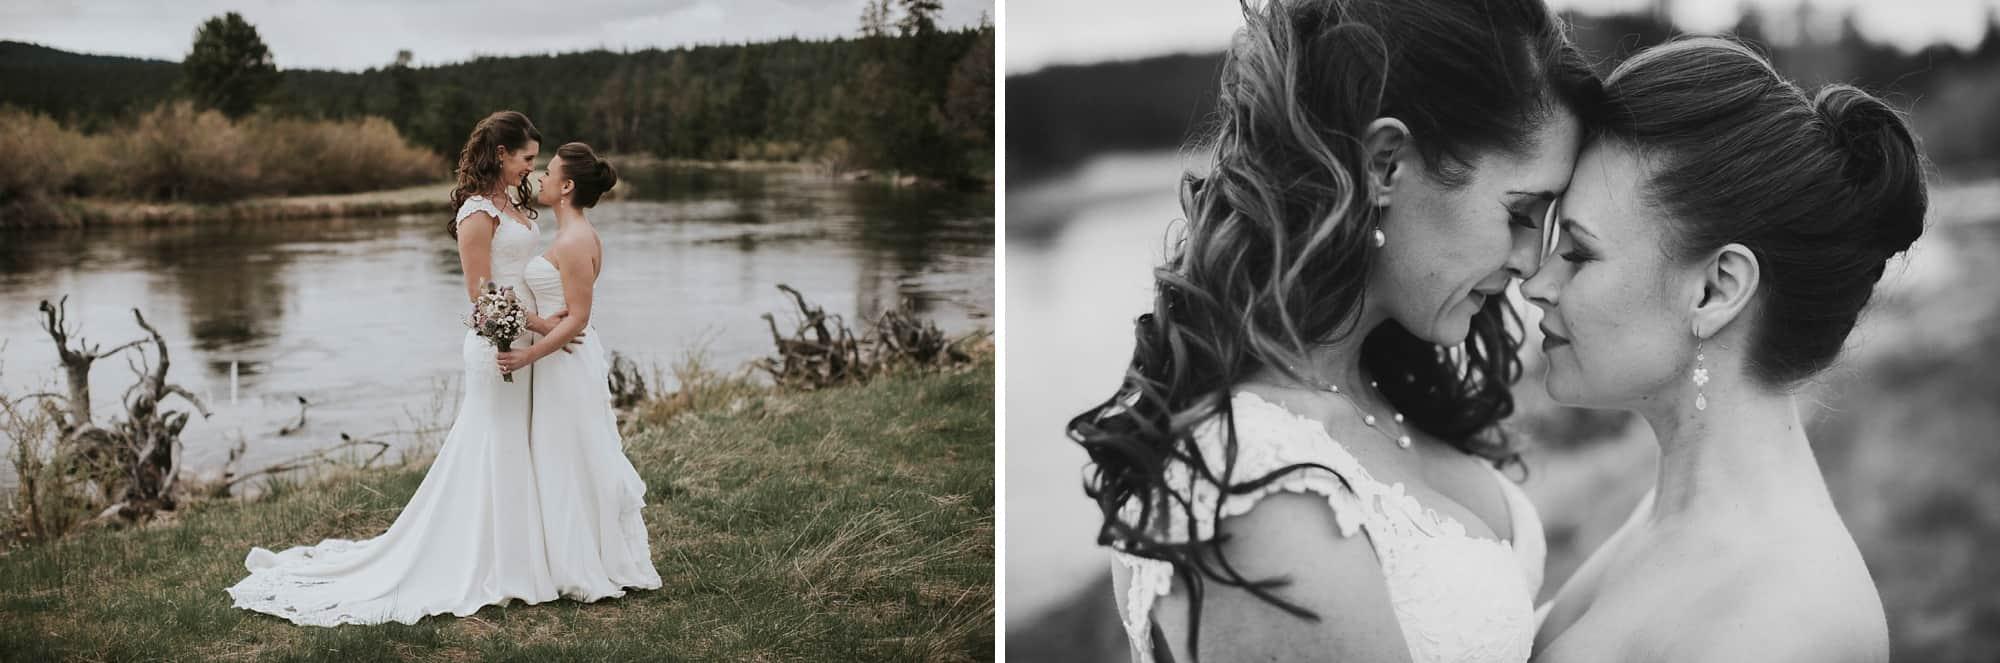 Sara Emily Sunriver Bend Oregon Rustic Lodge Wedding 0032